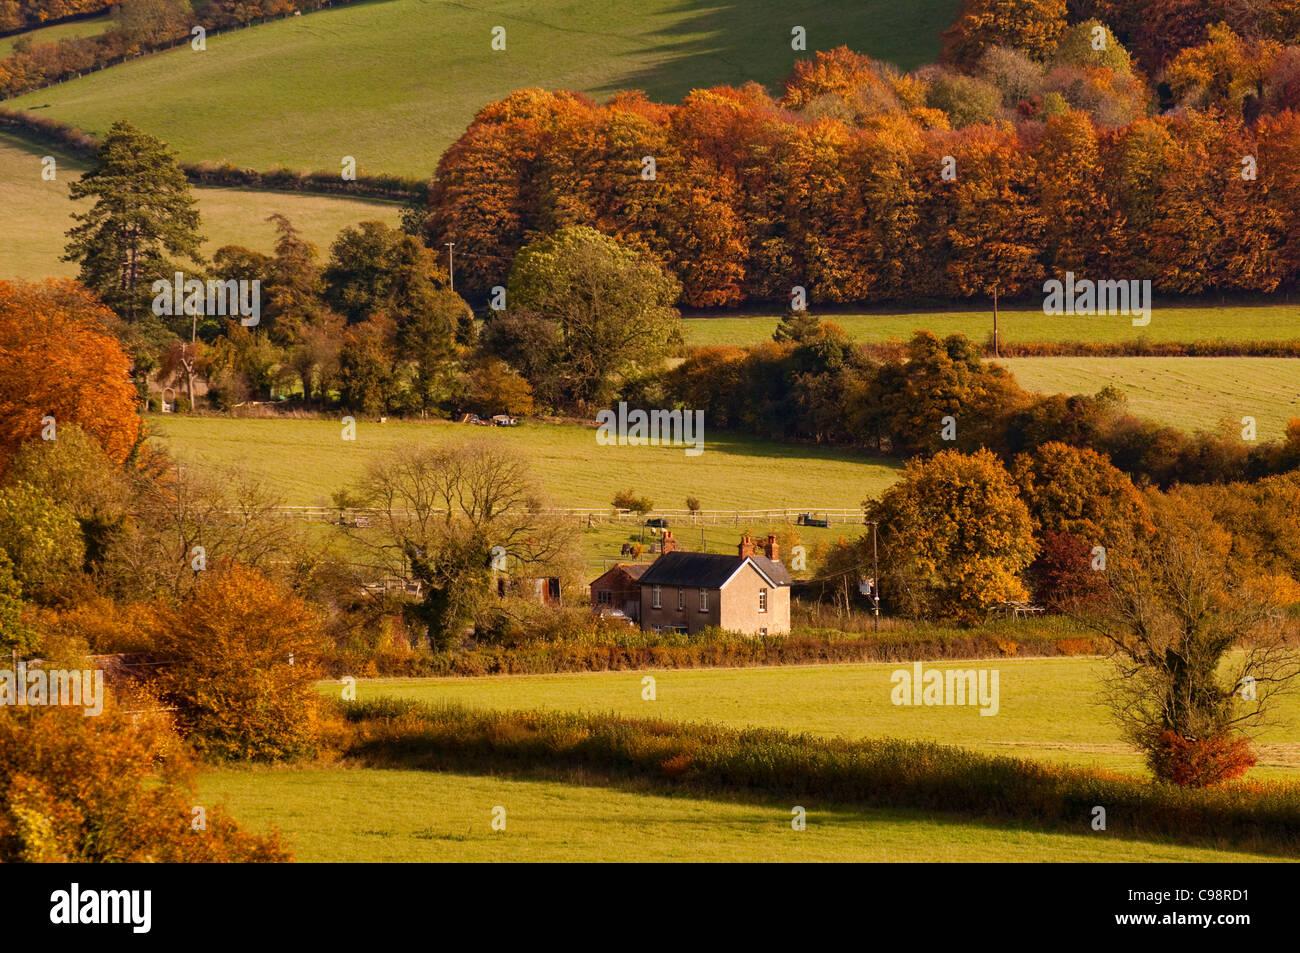 Chiltern Hills near Turville, Buckinghamshire - Stock Image